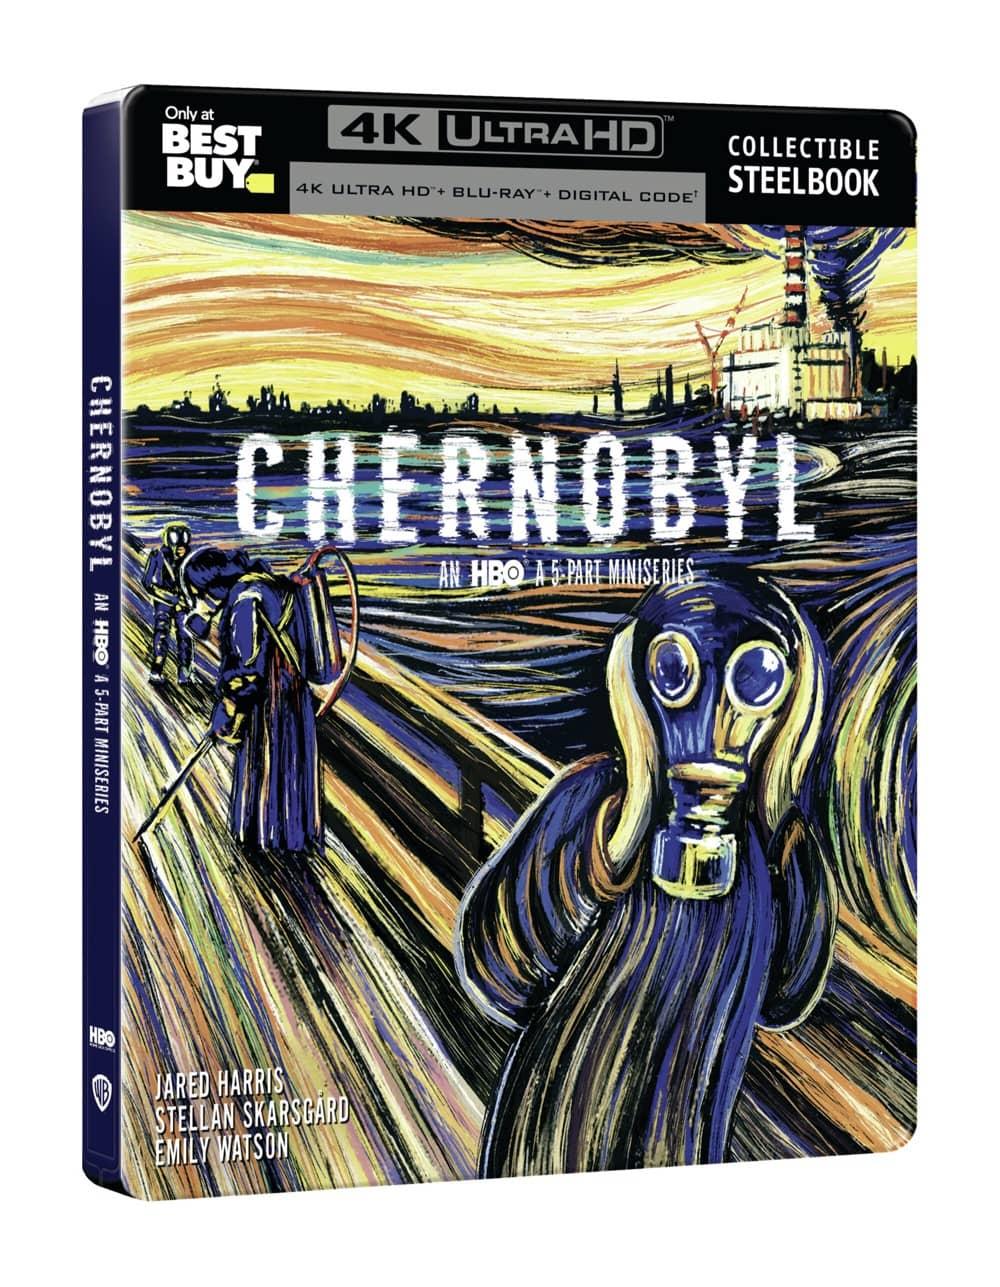 CHERNOBYL 4K UHD BBY Steelbook 1